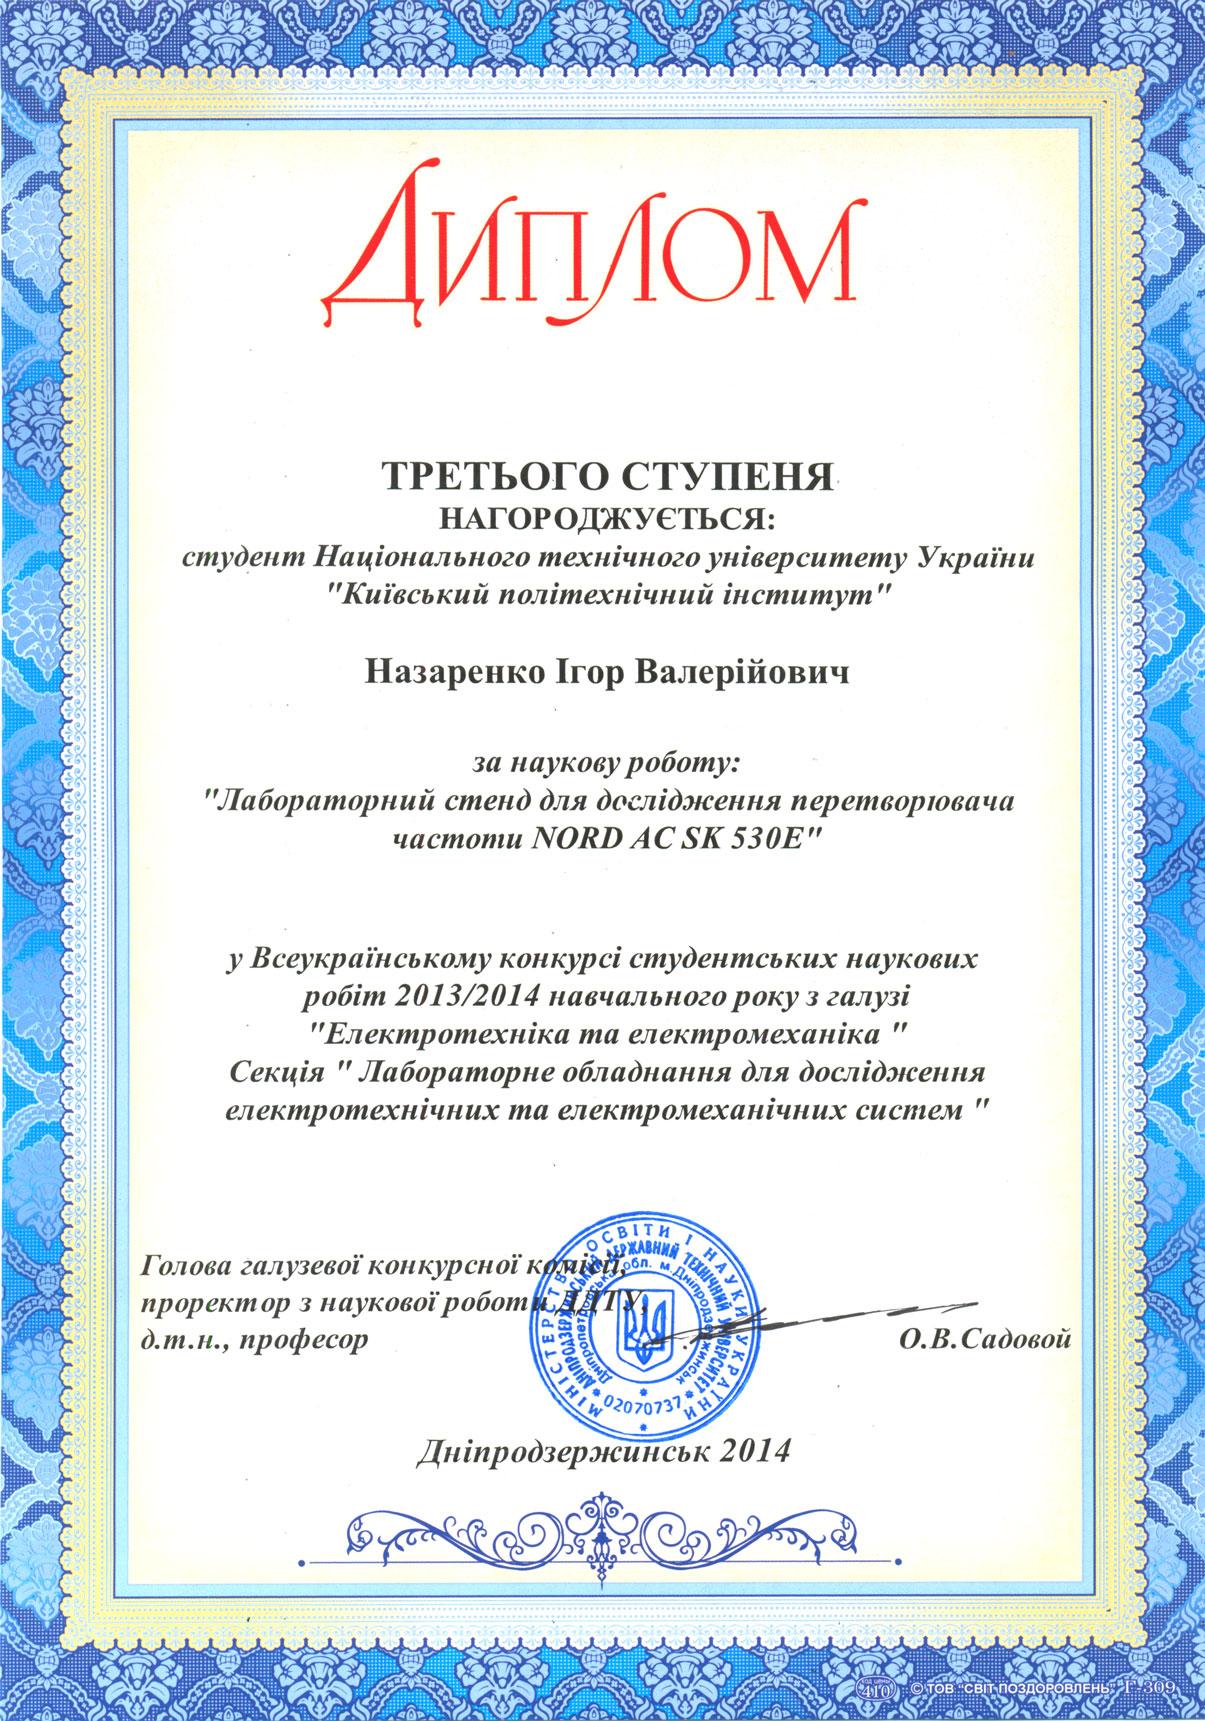 Всеукраїнський конкурс студентських наукових робіт 2014 diplom_igor